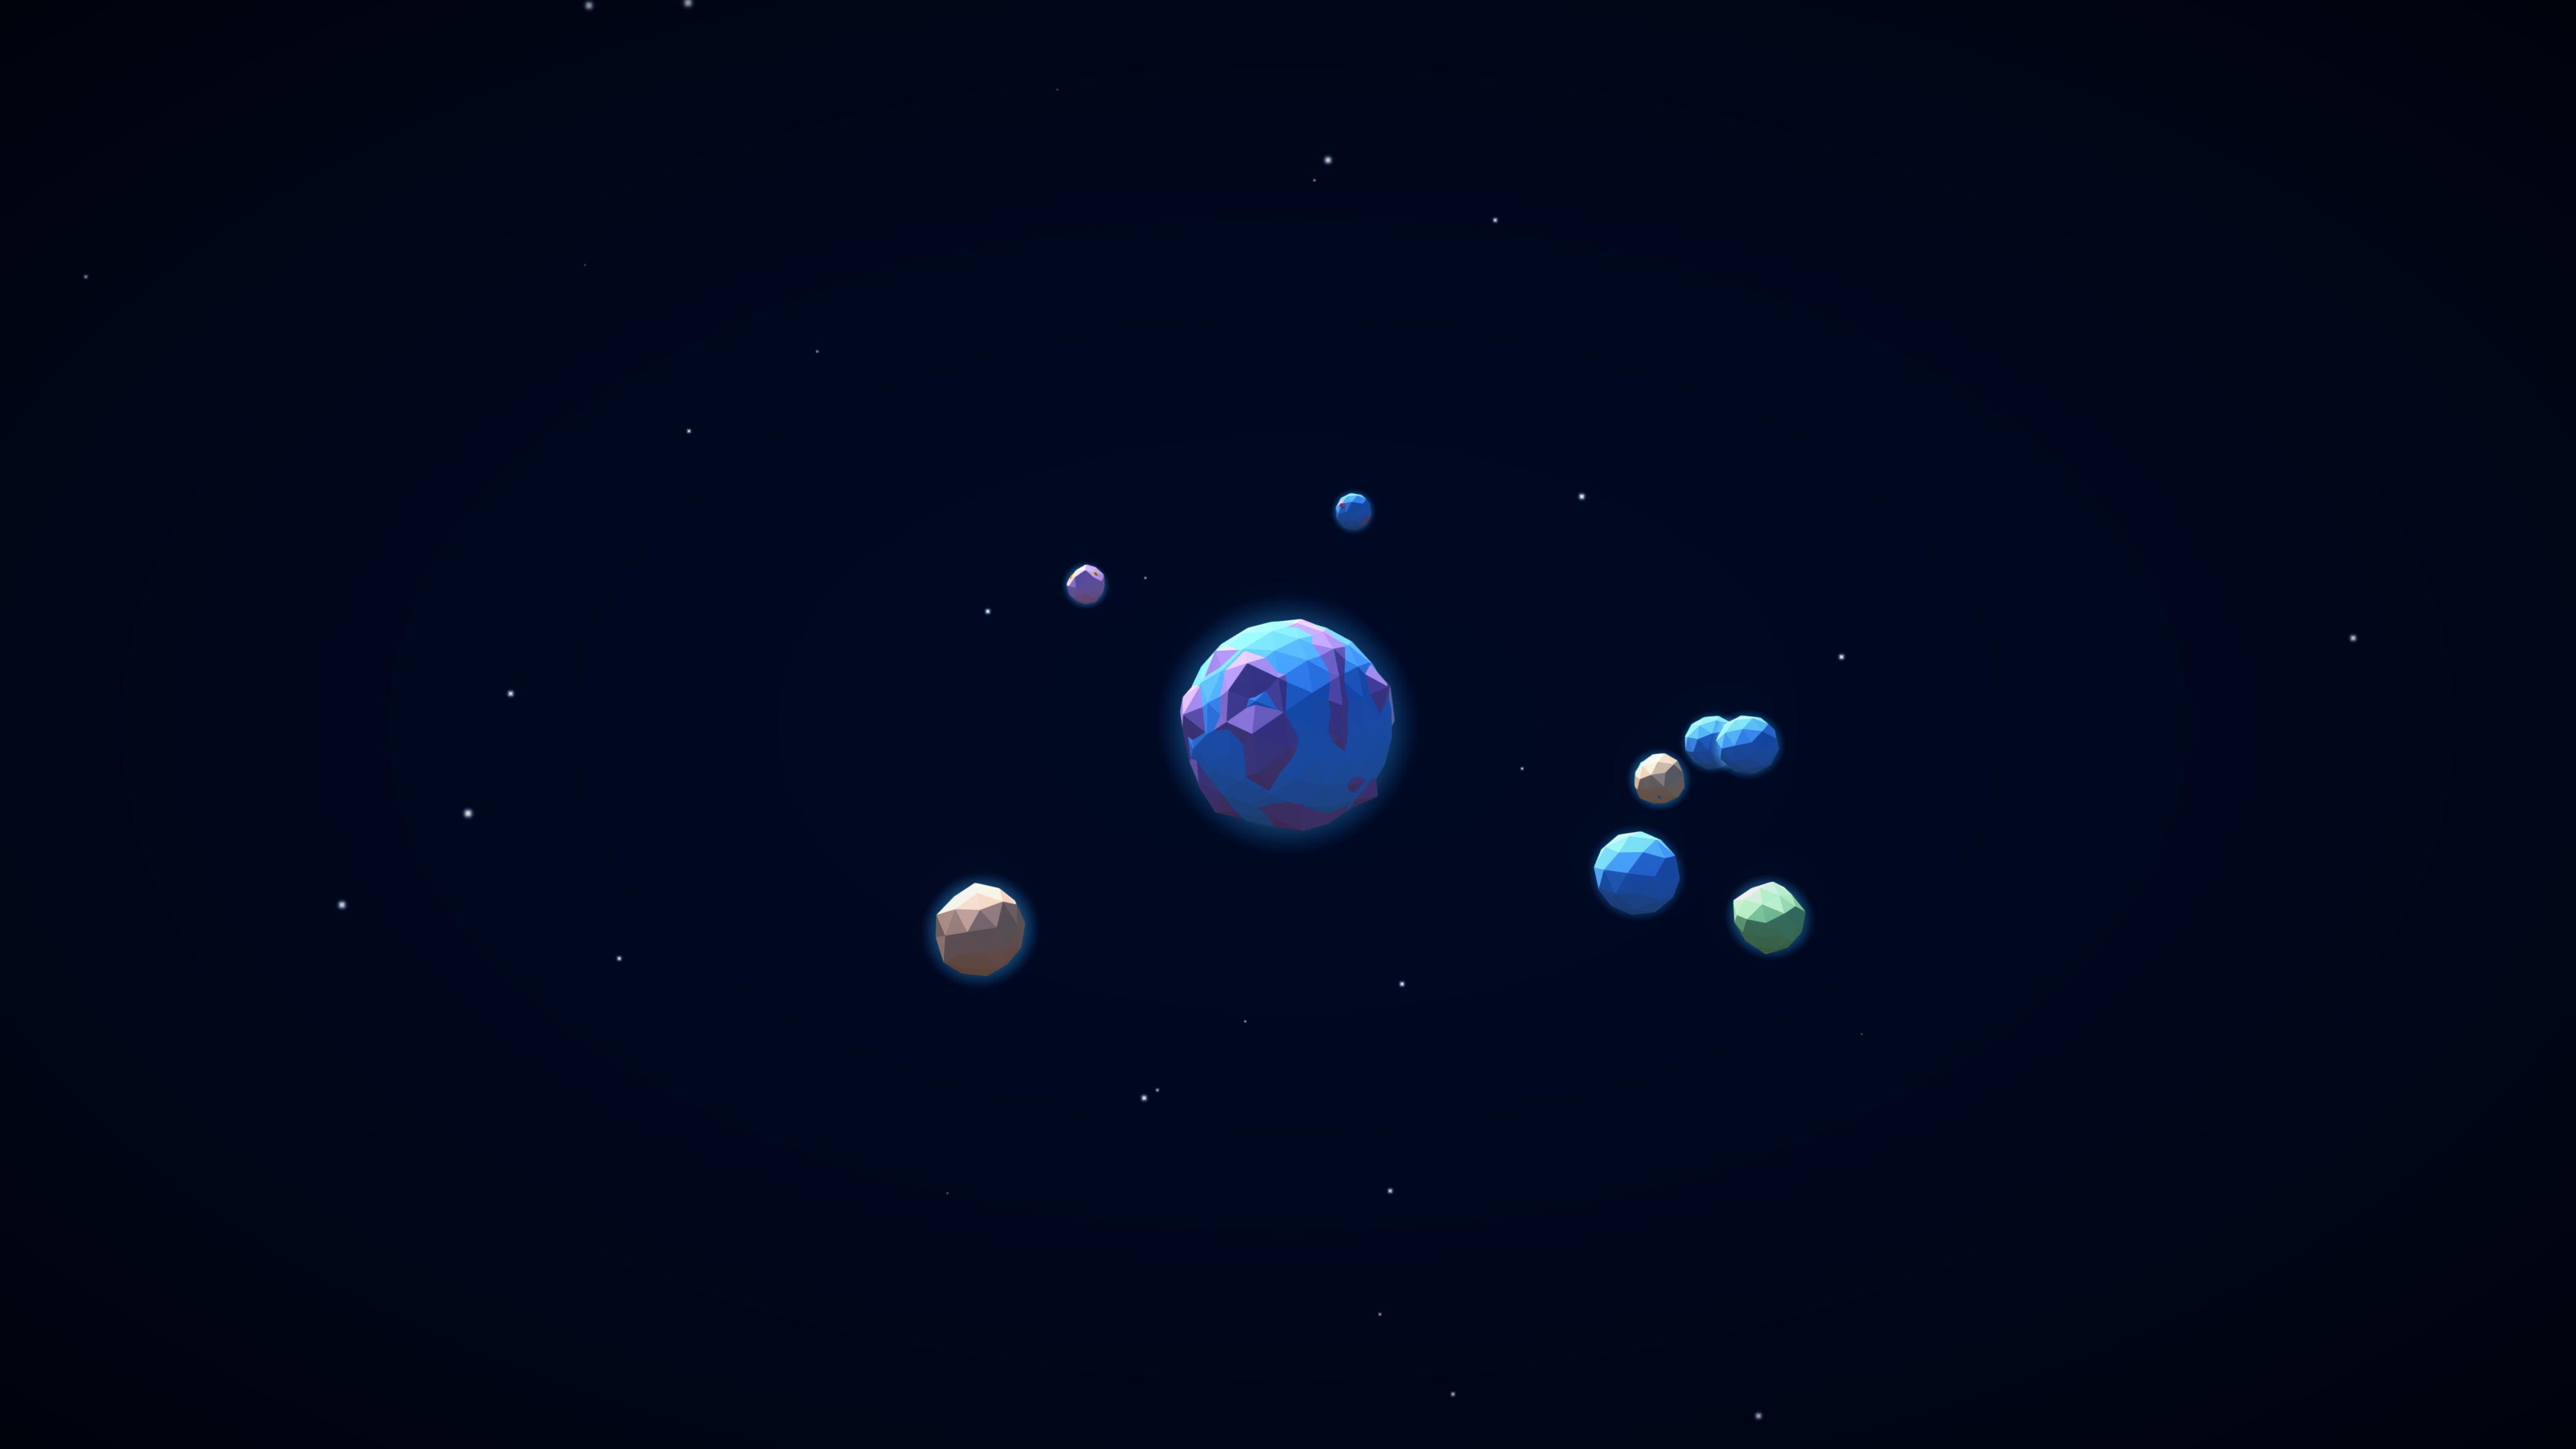 Round blue ball clip art, stars, galaxy, planet, space HD.